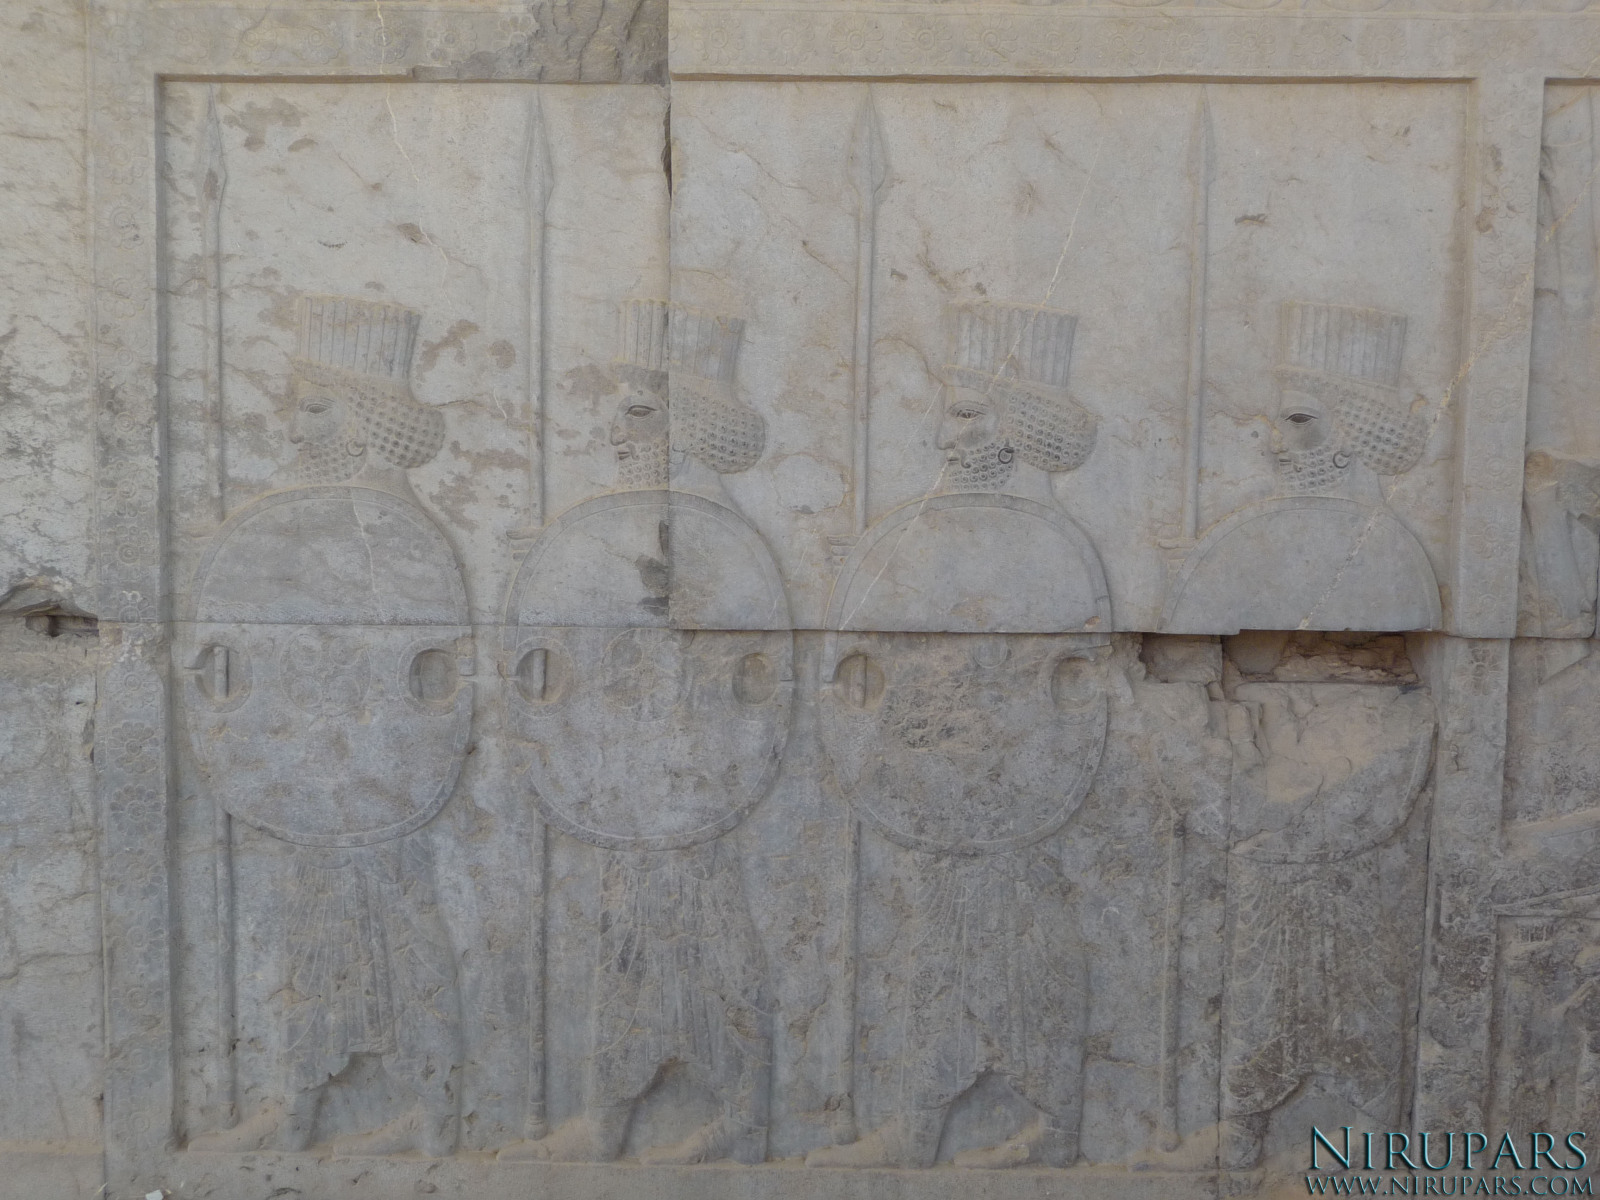 Persepolis - Council Hall Tripylon - North Portico - Relief Palace Troops